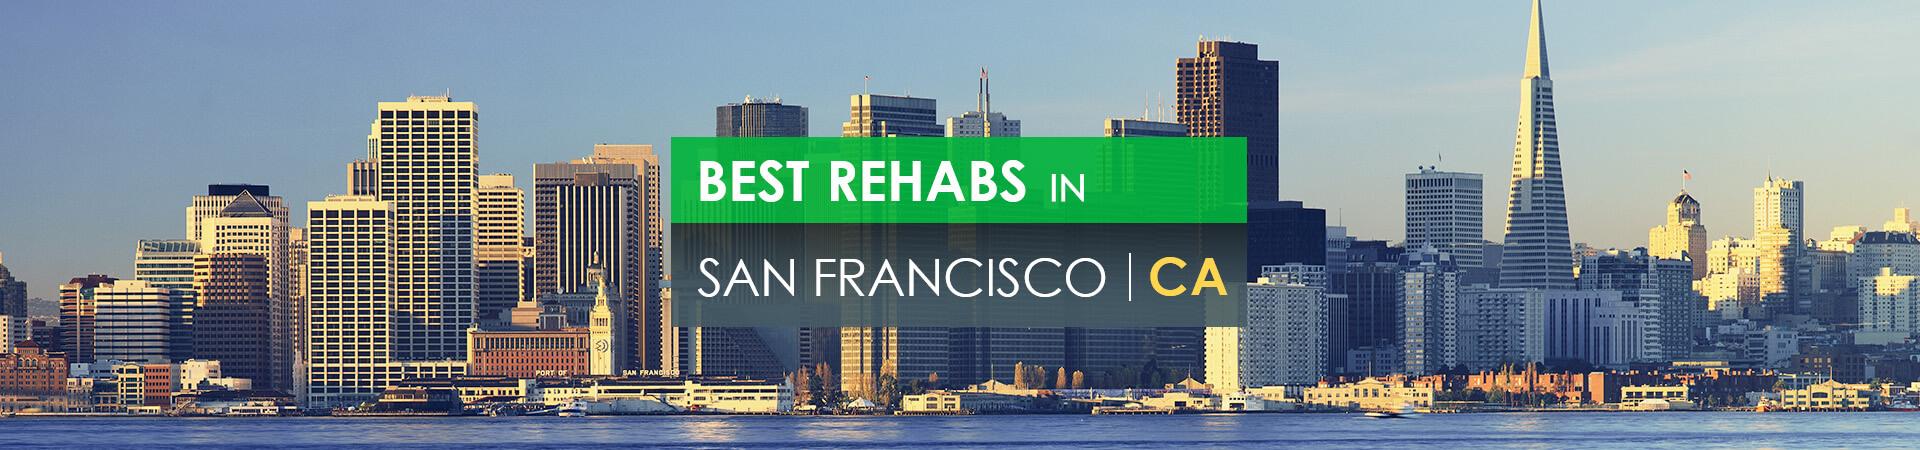 Best rehabs in San Francisco, CA